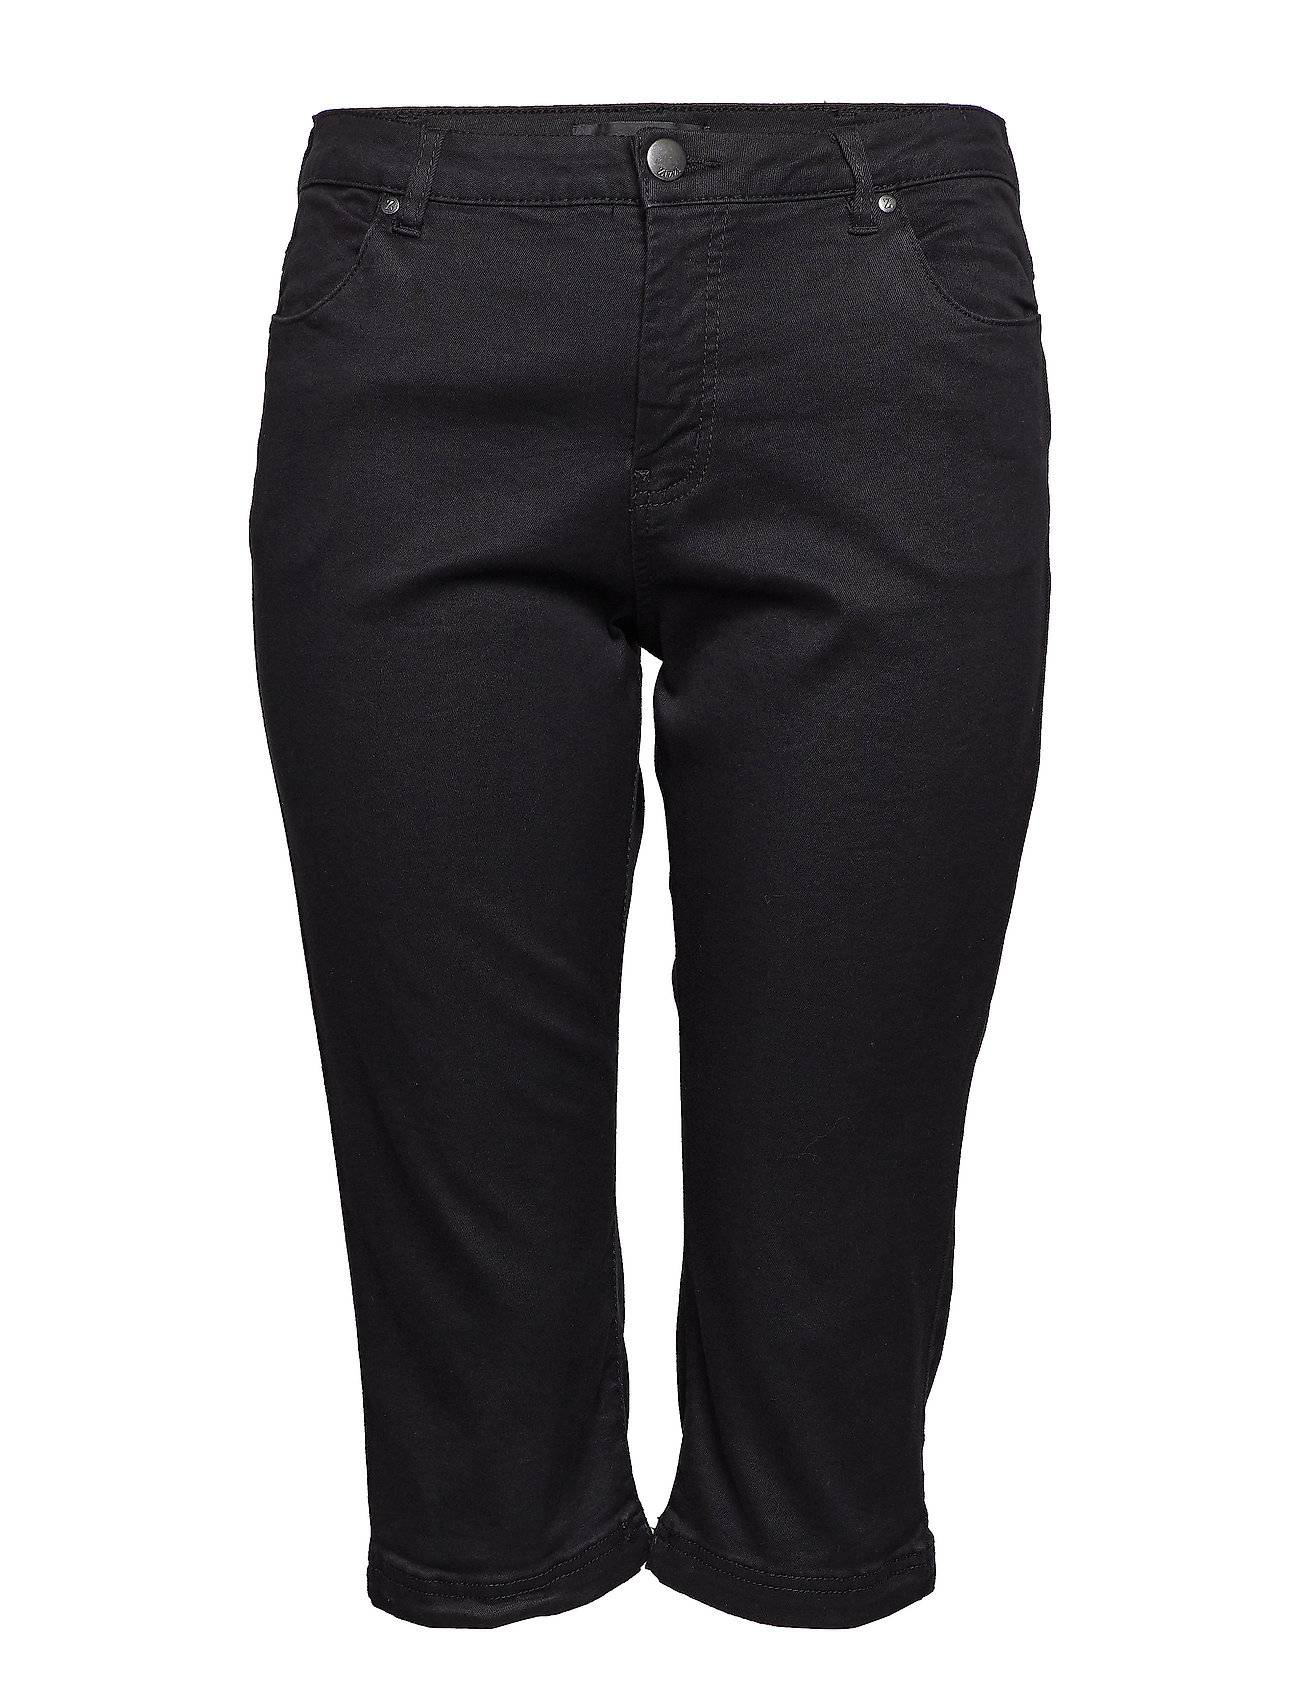 Zizzi Jeans, Emily, Capri